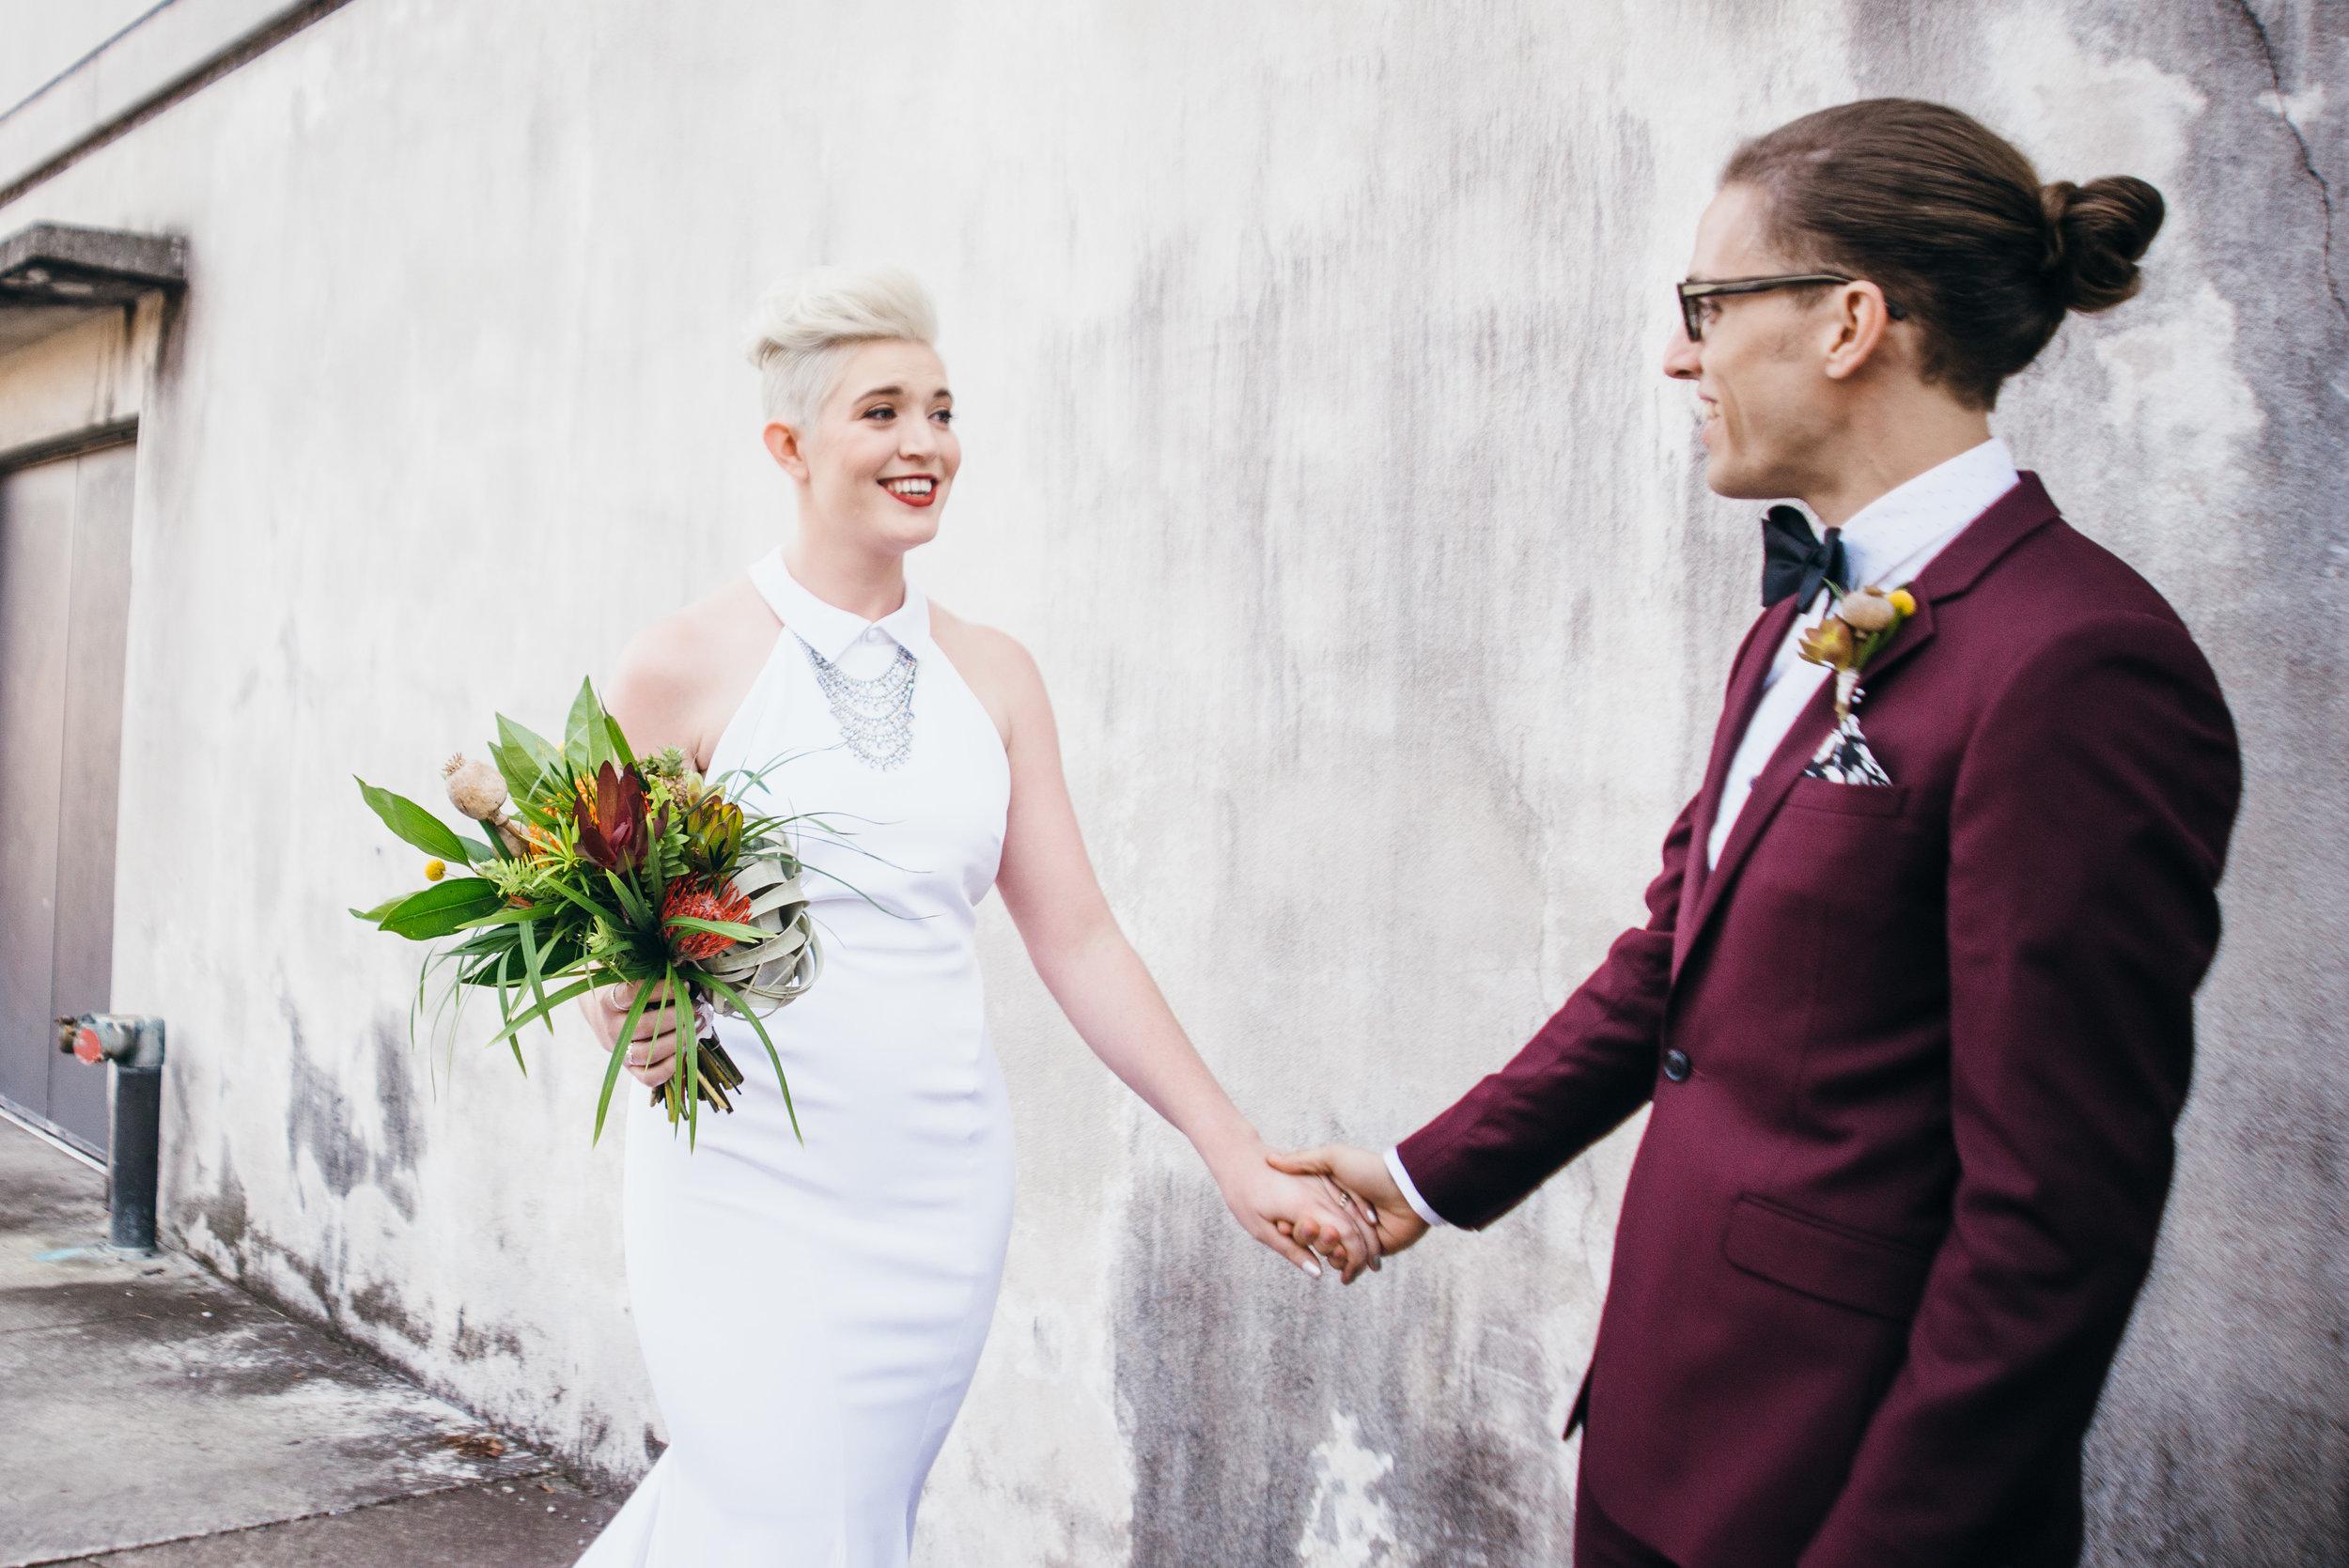 julia-hembree-photography-eden-village-church-wedding-savannah-warehouse-wedding-ivory-and-beau-bridal-boutique-savannah-florist-savannah-wedding-planner-savannah-event-design-scad-wedding-artist-wedding-savannah-funky-wedding-handmade-wedding-20.jpg